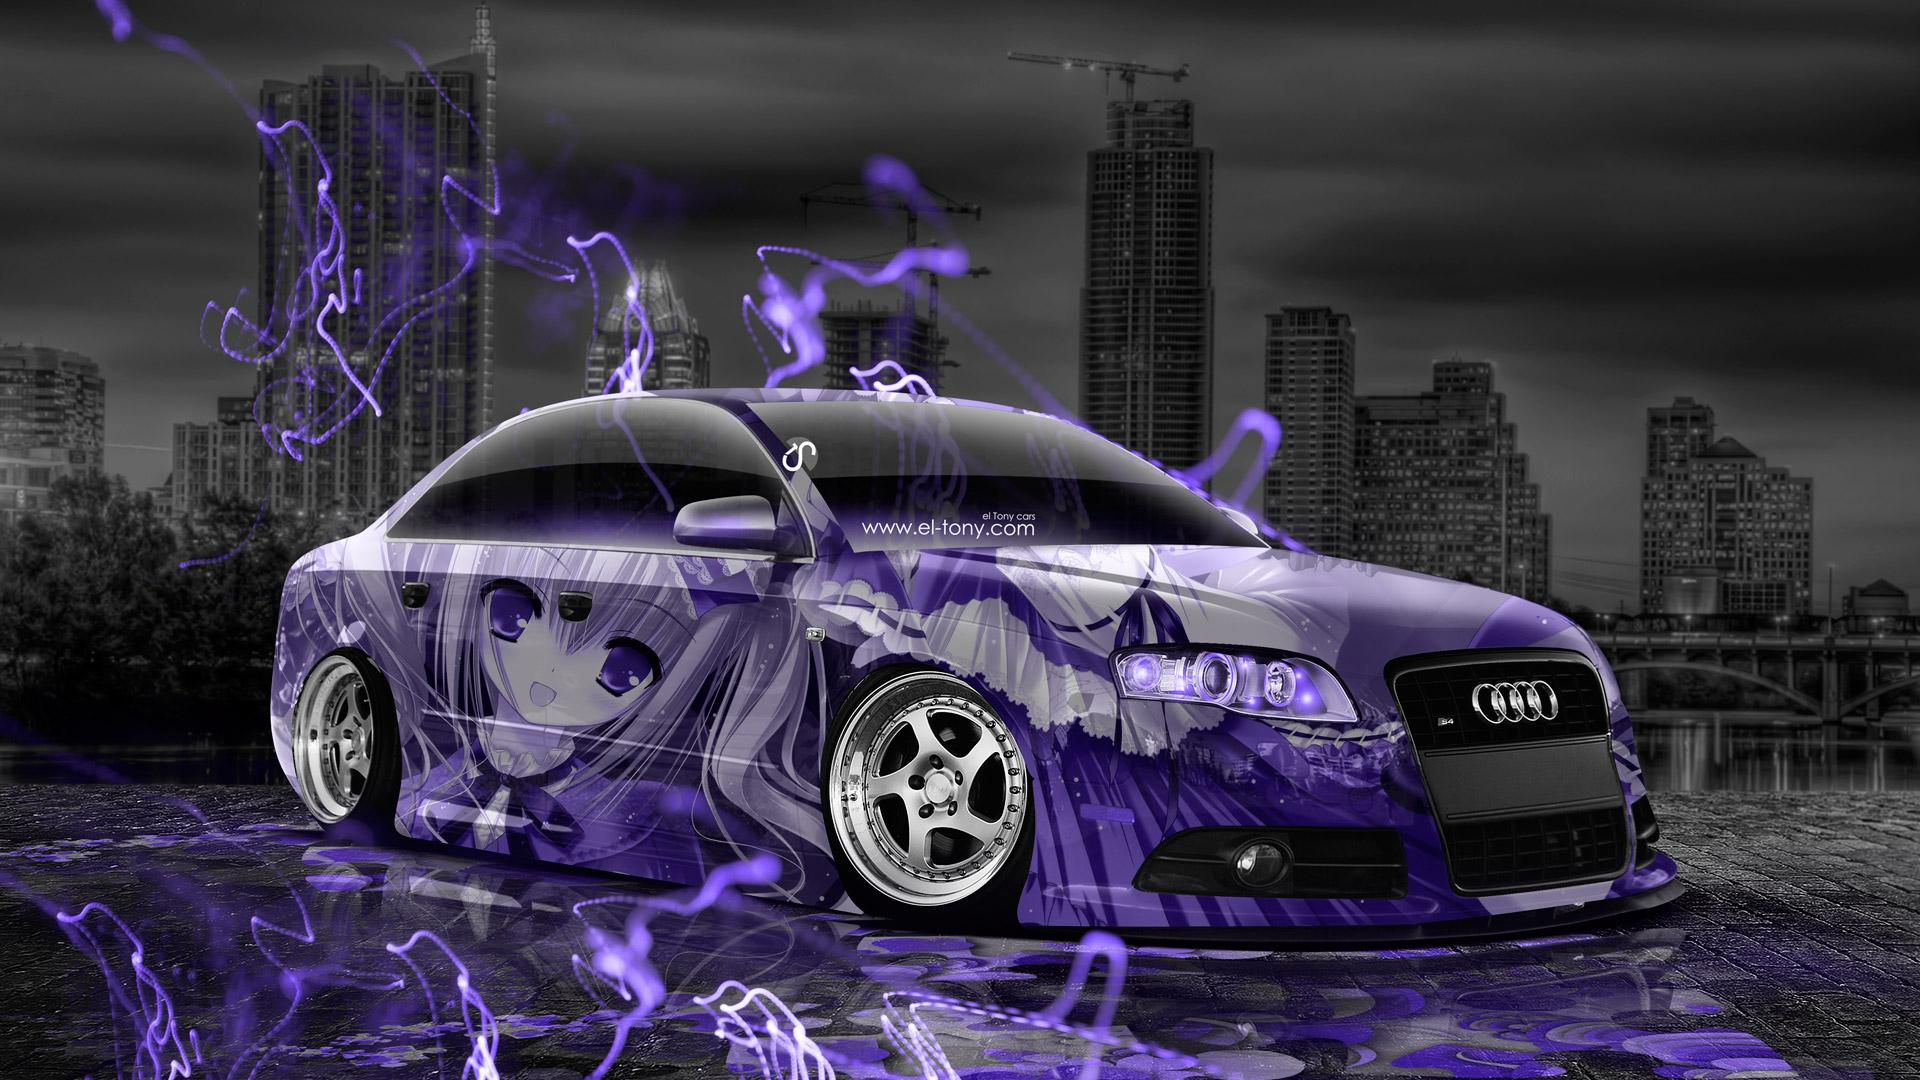 download Anime Girl Aerography City Car 2015 Violet Neon 1920x1080